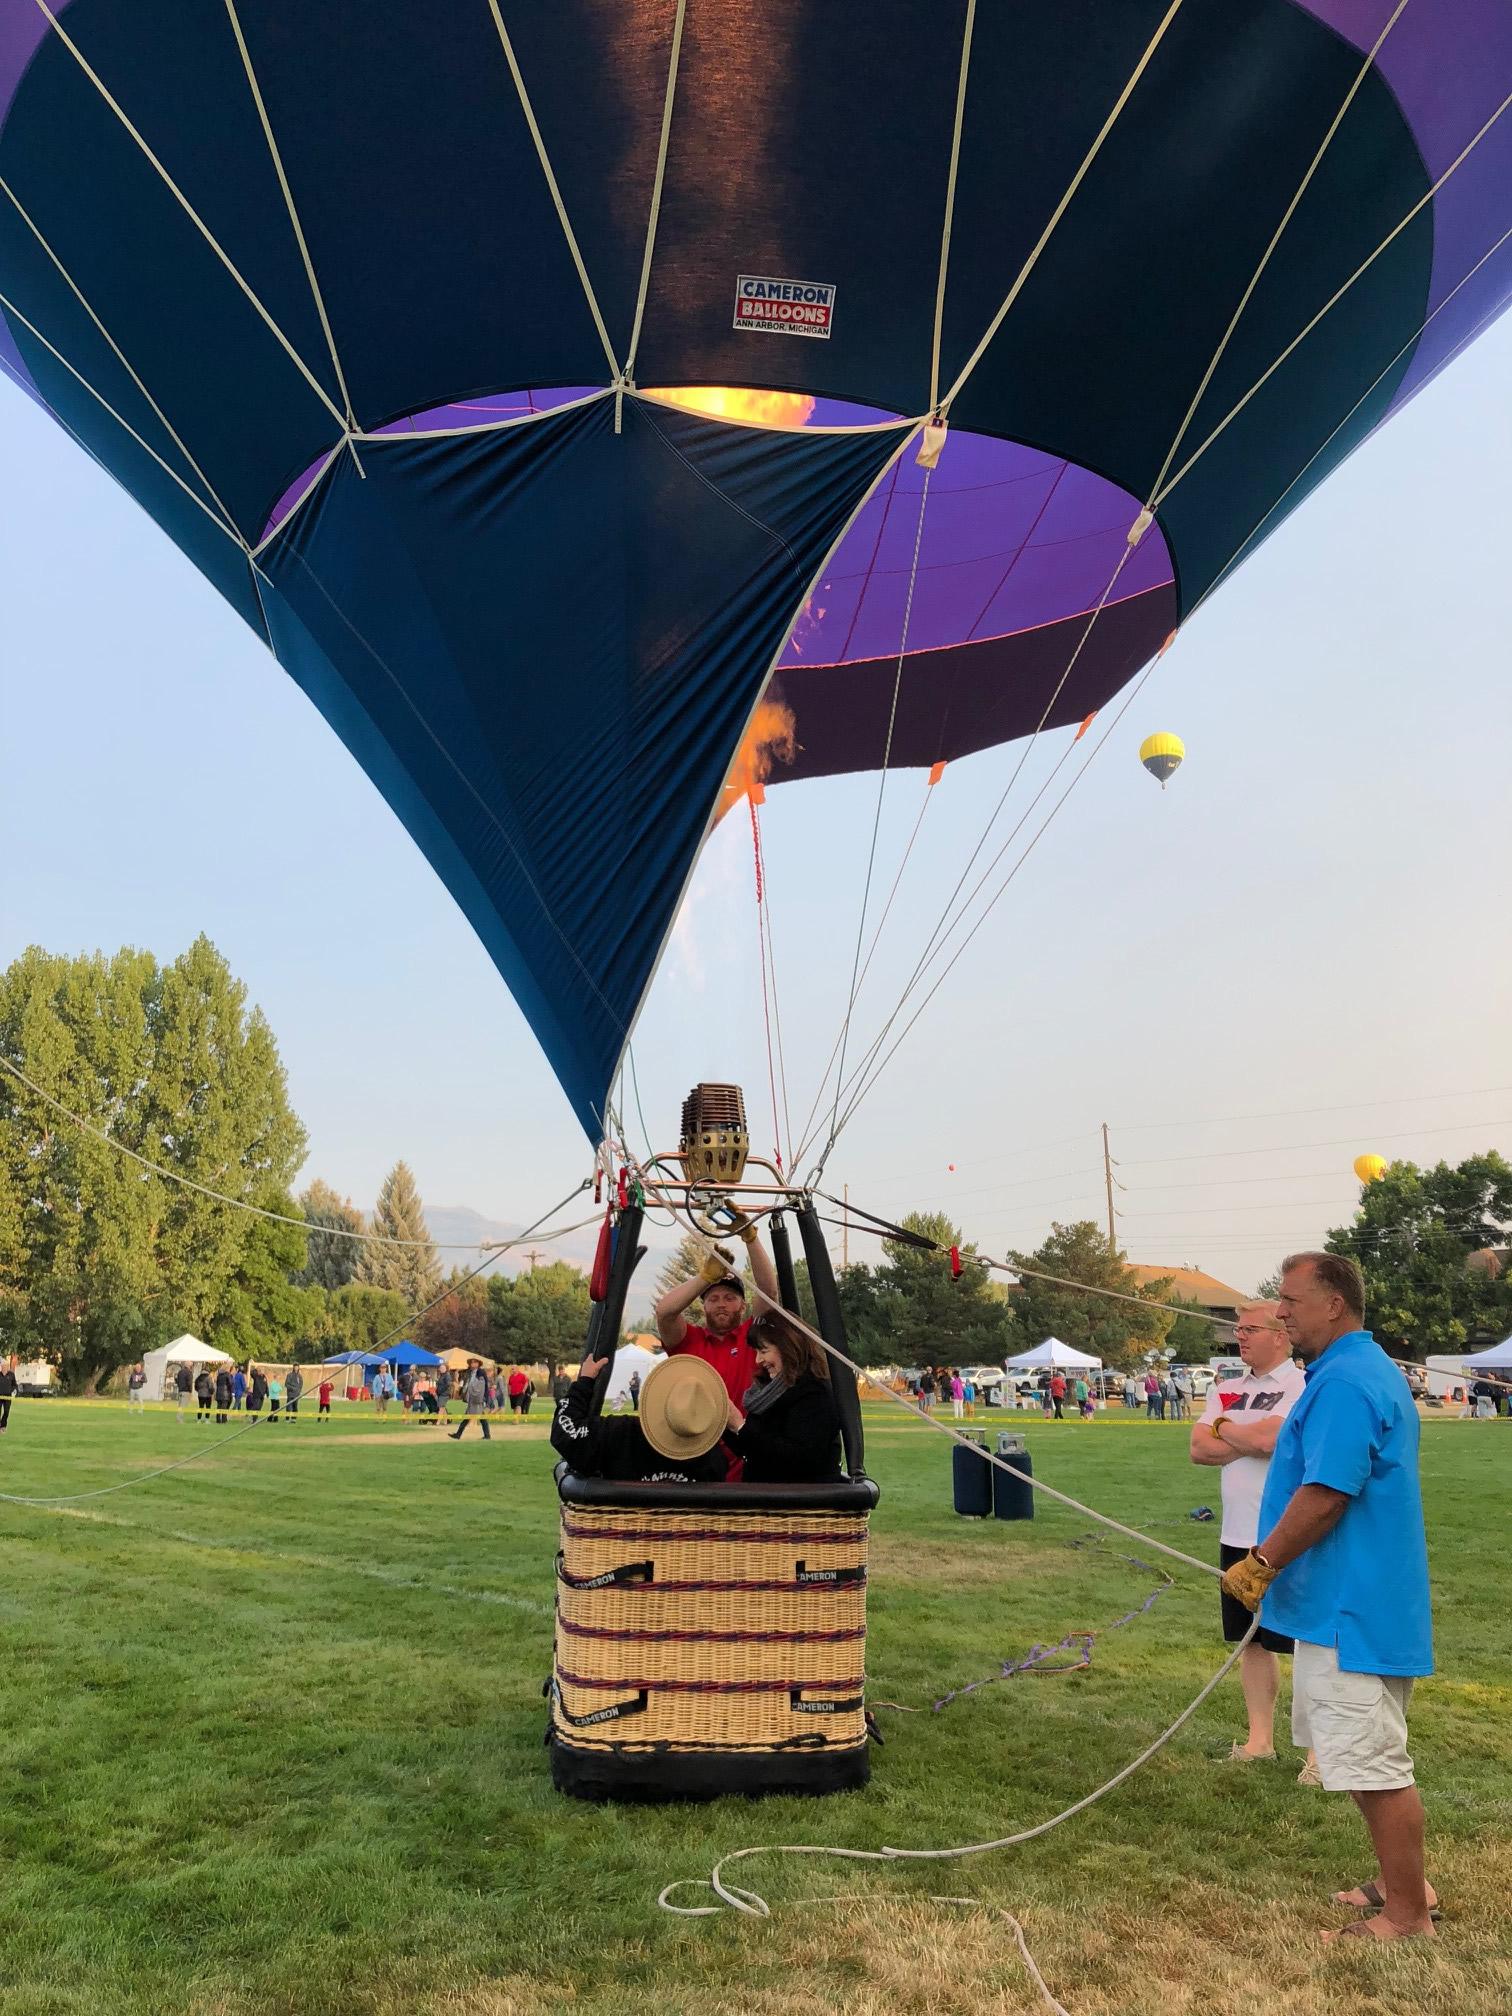 RE/MAX free tethered hot air balloon flight ride